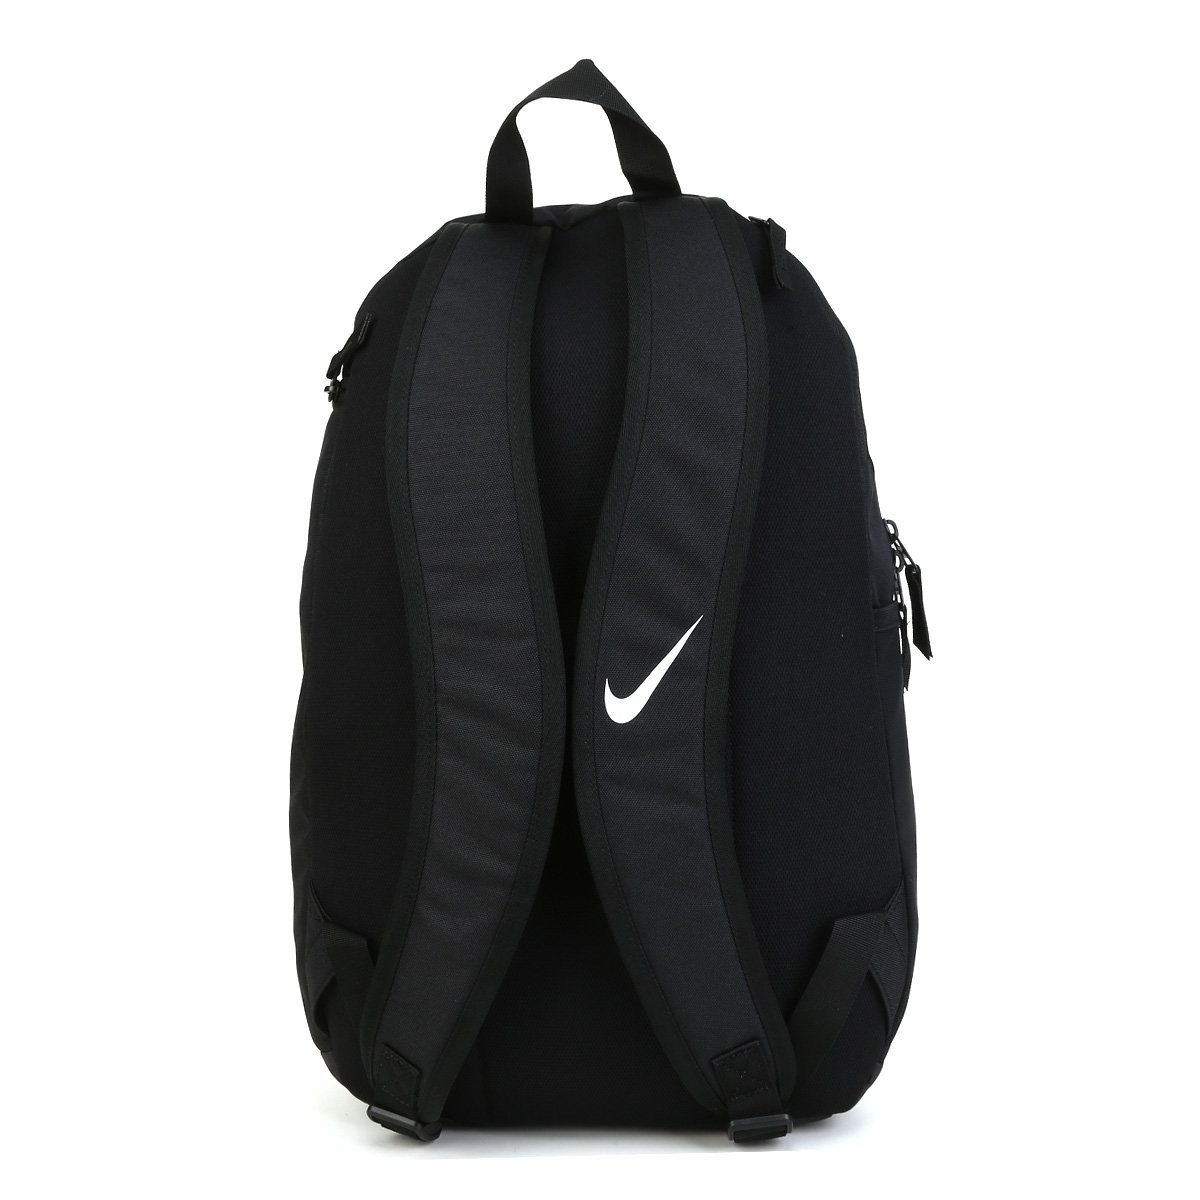 Mochile Nike Academy Team 30L - Preto